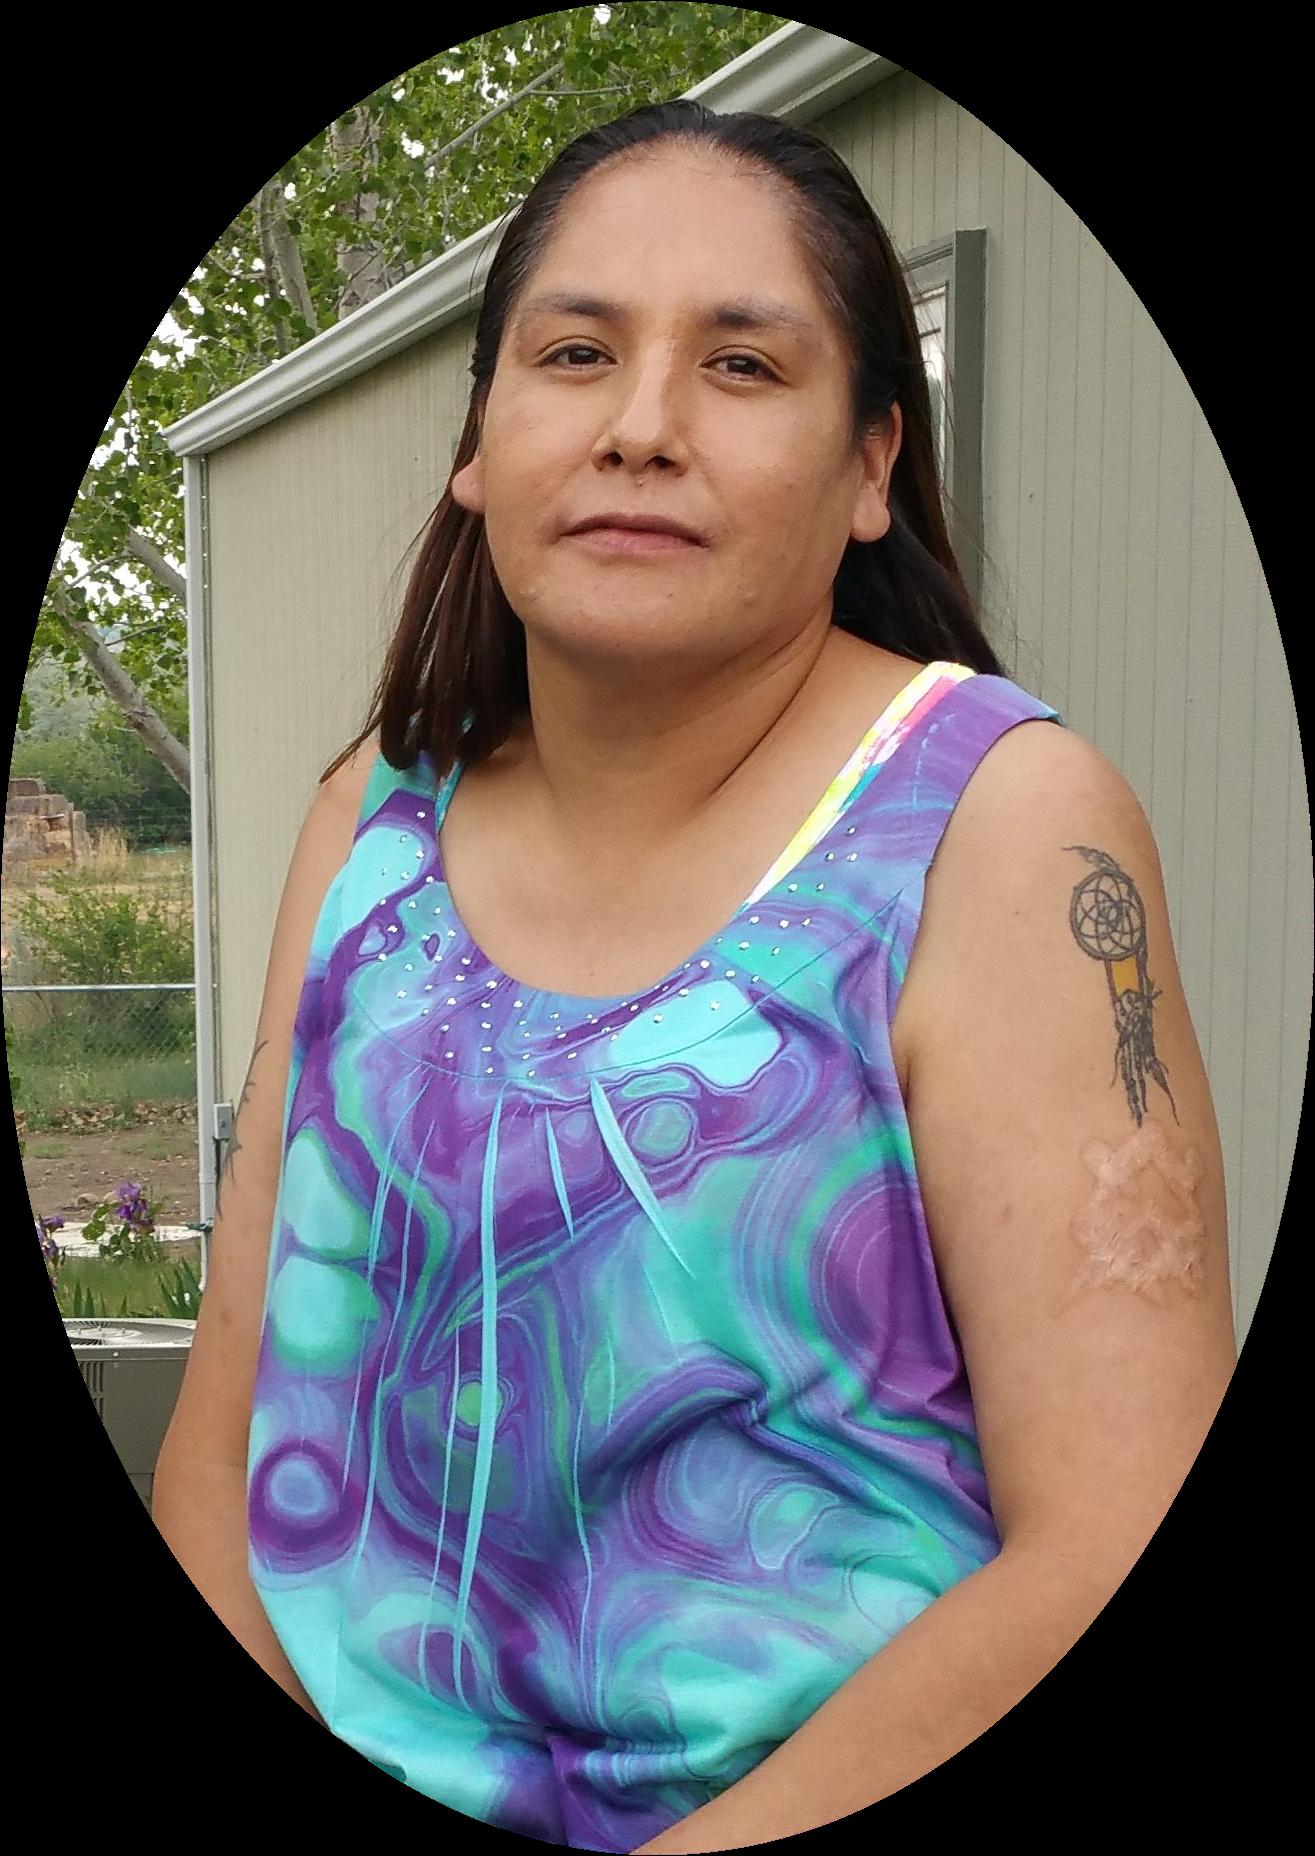 Johanna Marie Seminole age 38 of Lame Deer MT